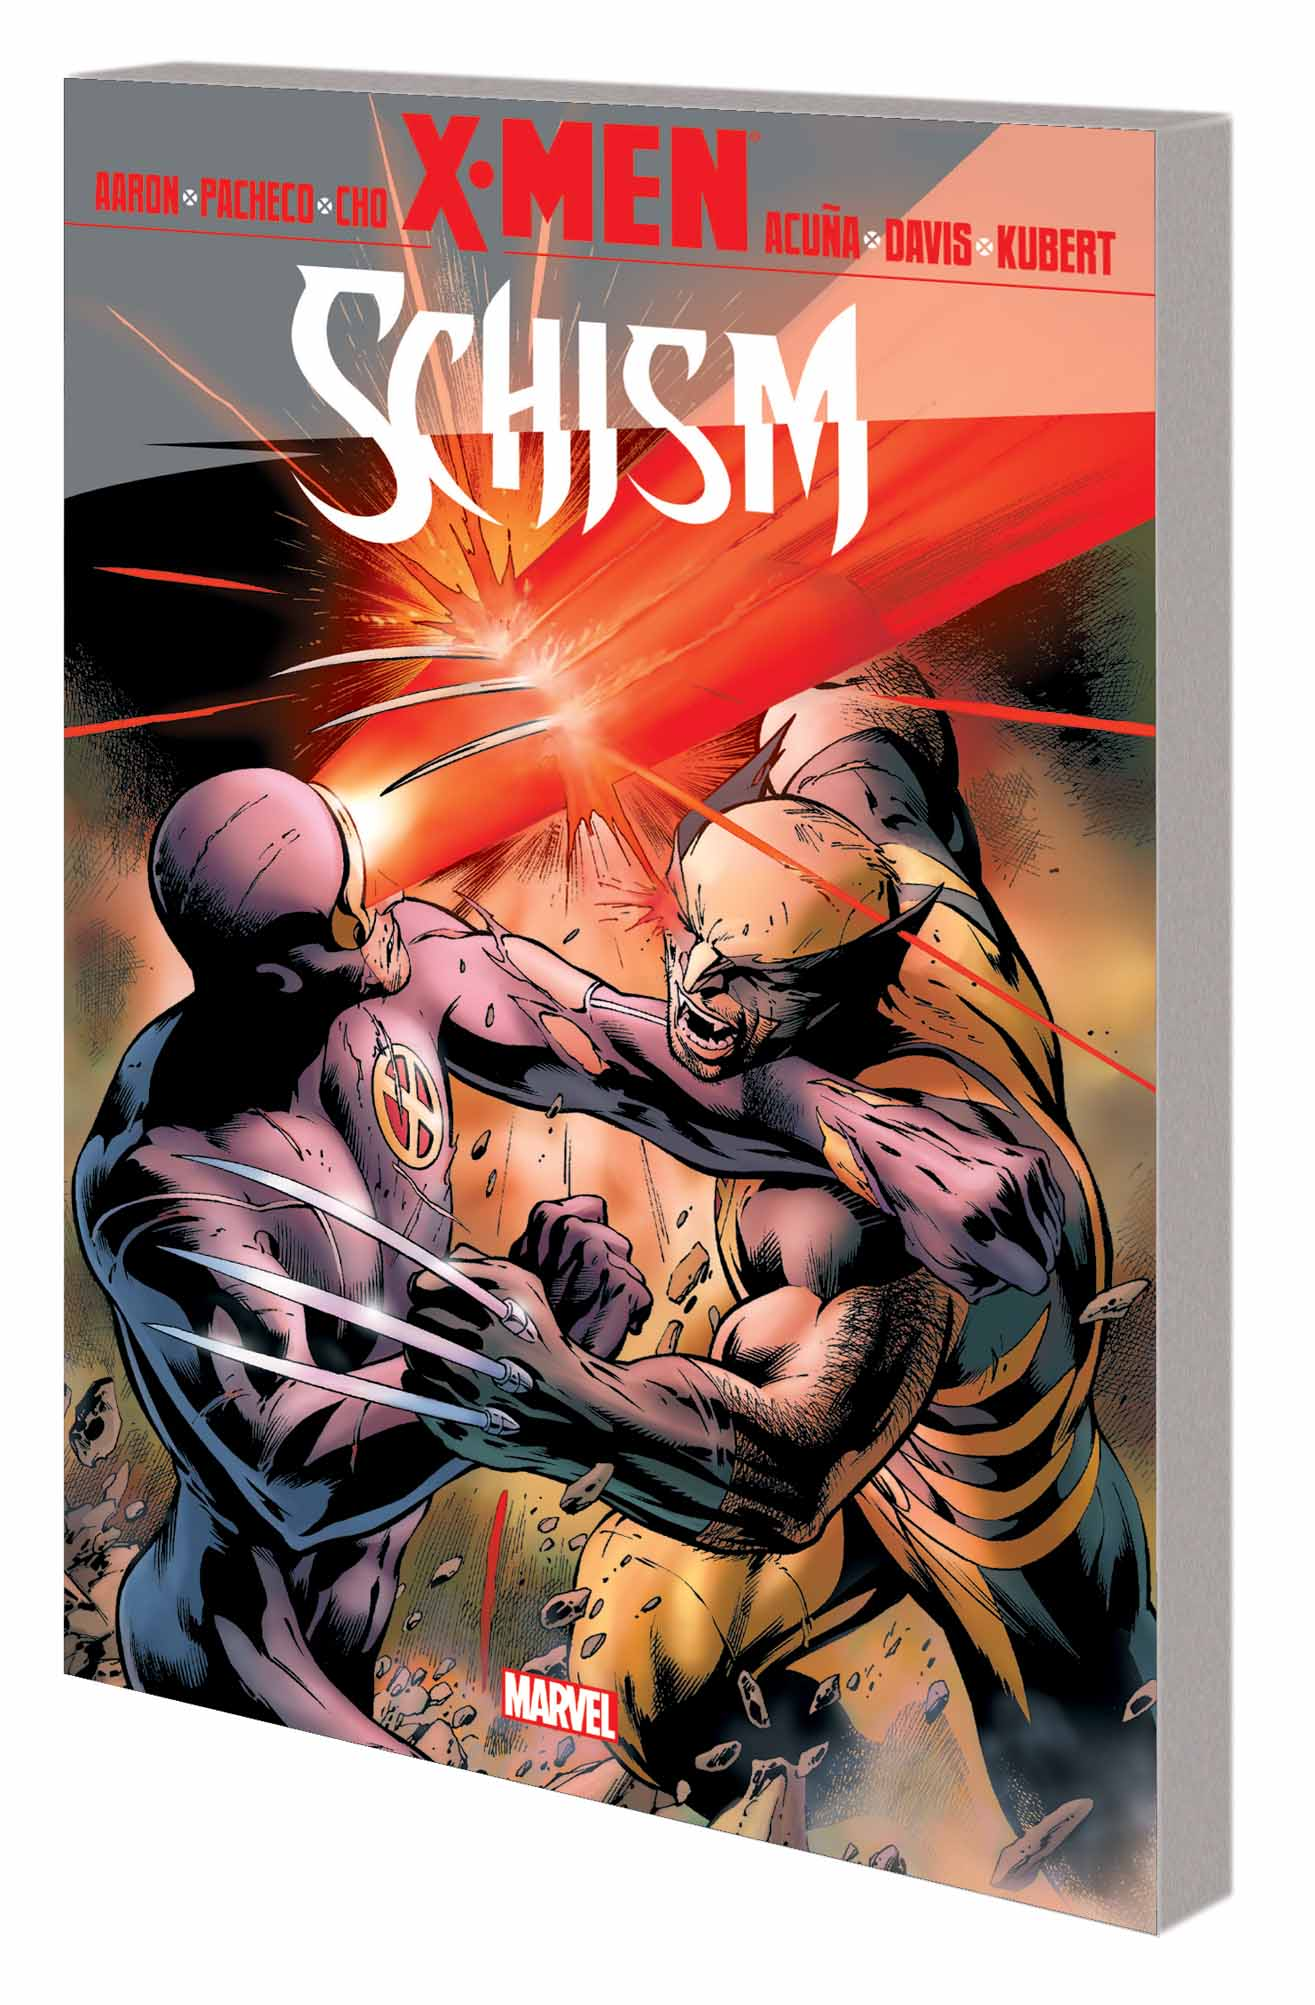 X-MEN: SCHISM TPB (Trade Paperback)